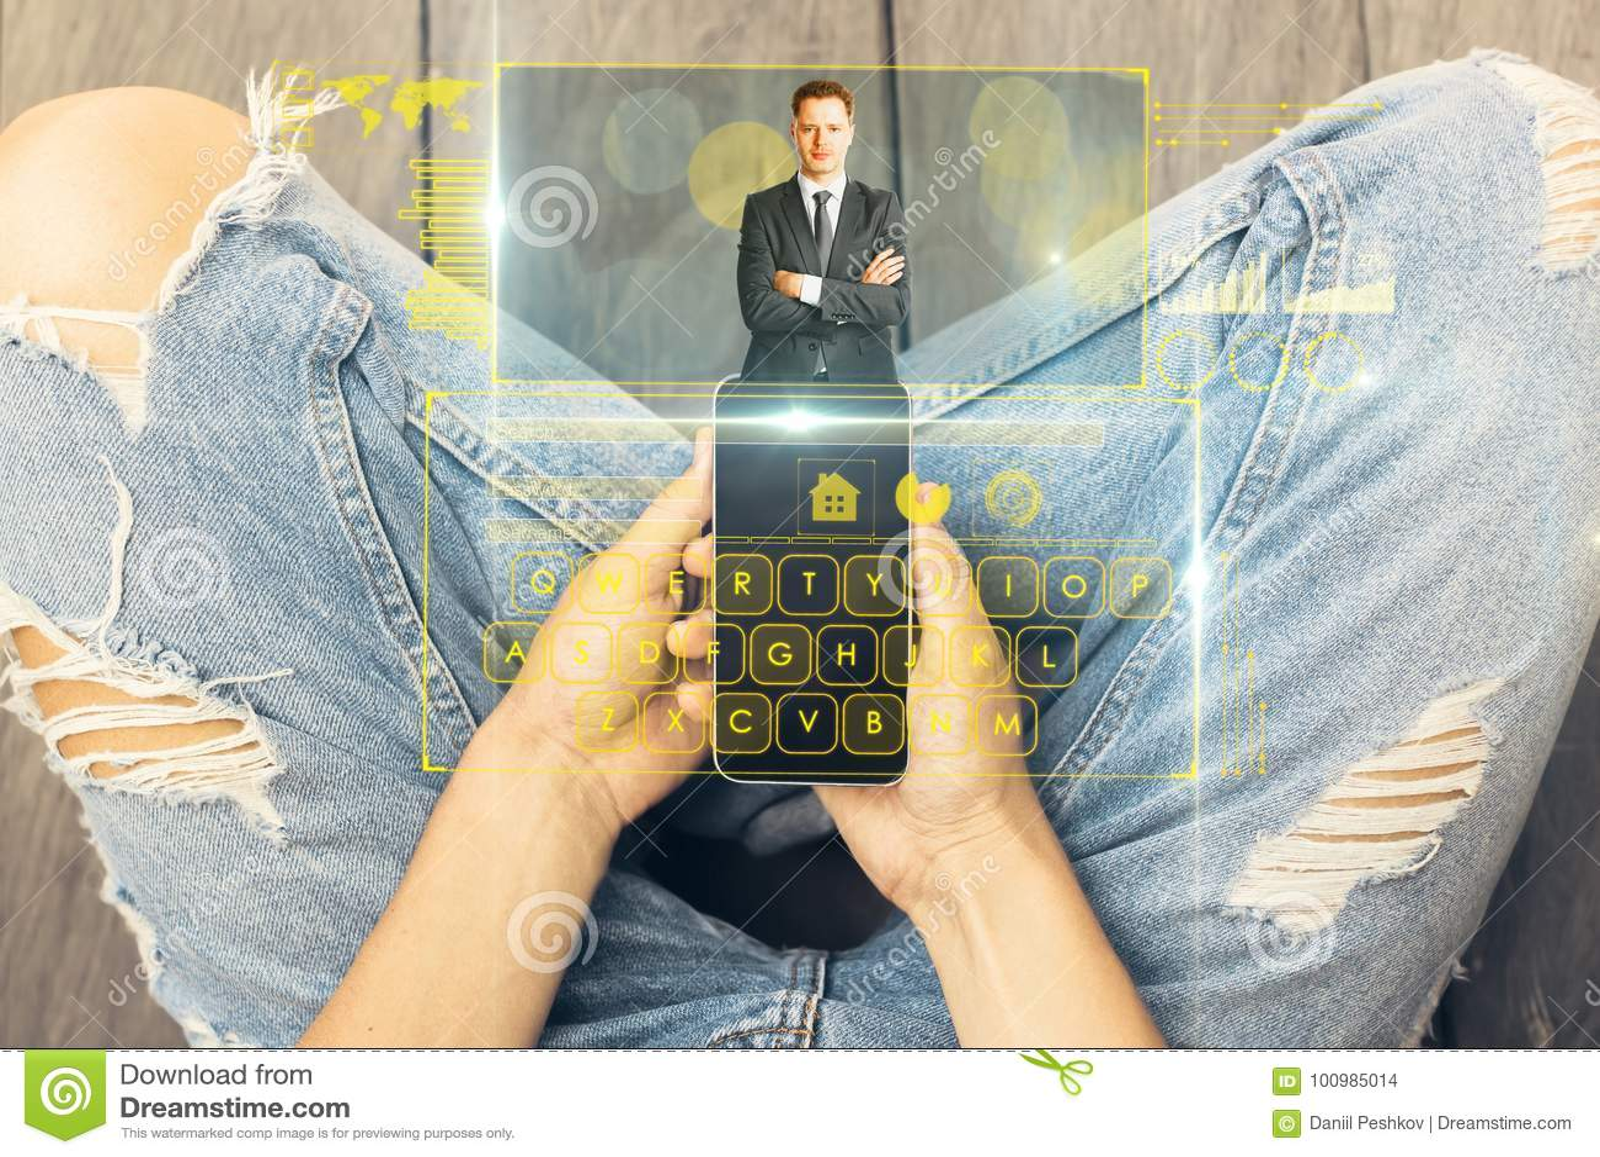 Concept mededeling, netwerk en financiën